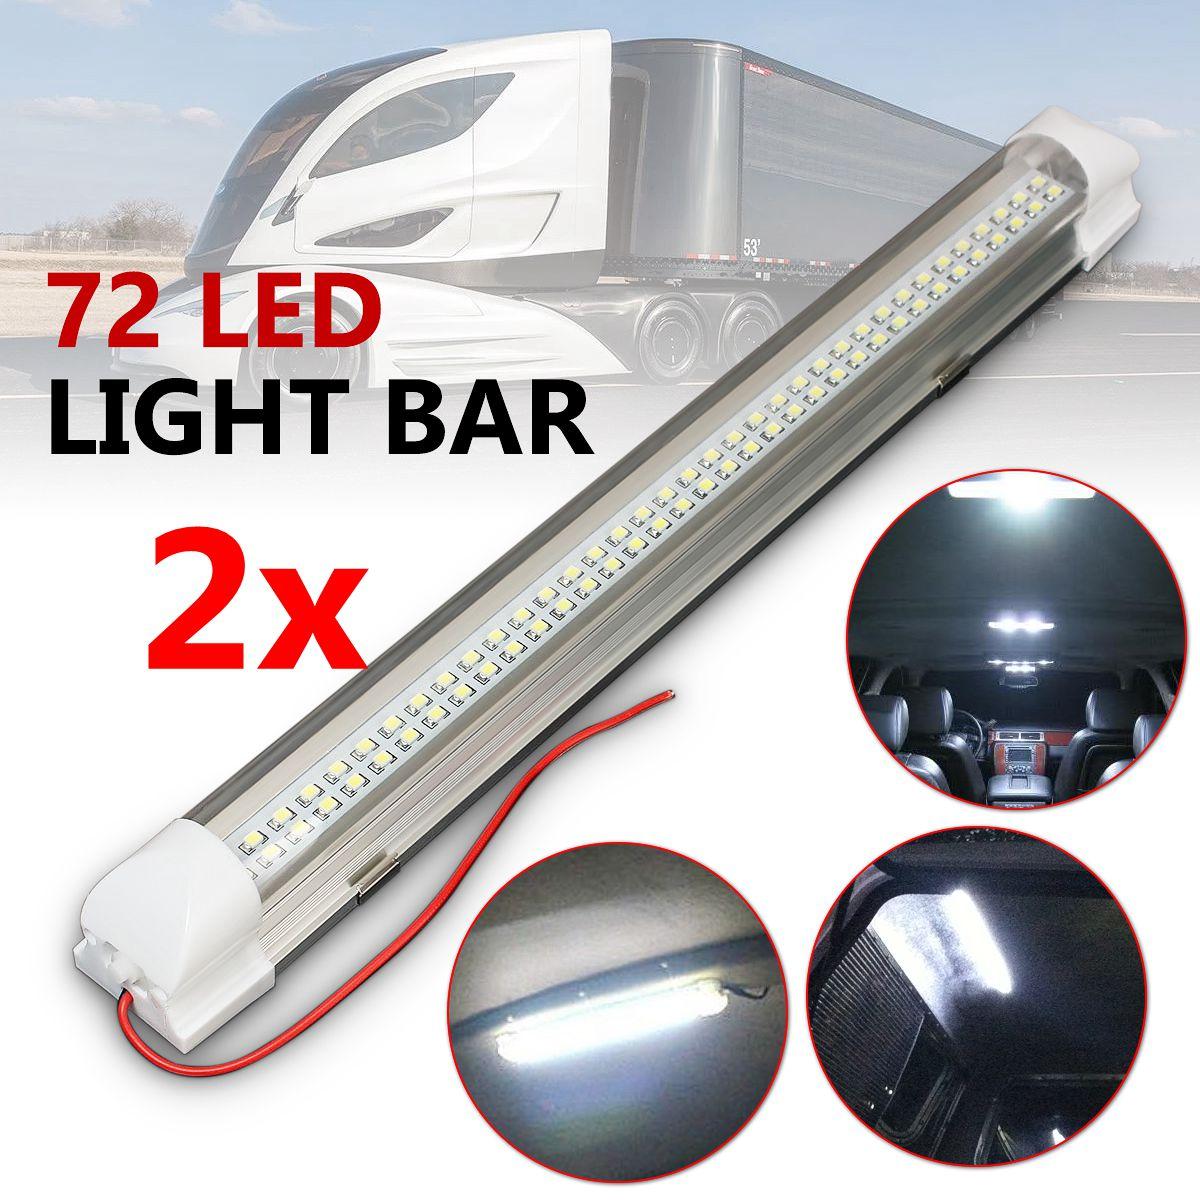 2X 72 LED Interior Light Strip Bar Car Van Bus Caravan ON//OFF Switch 12V 12 VOLT